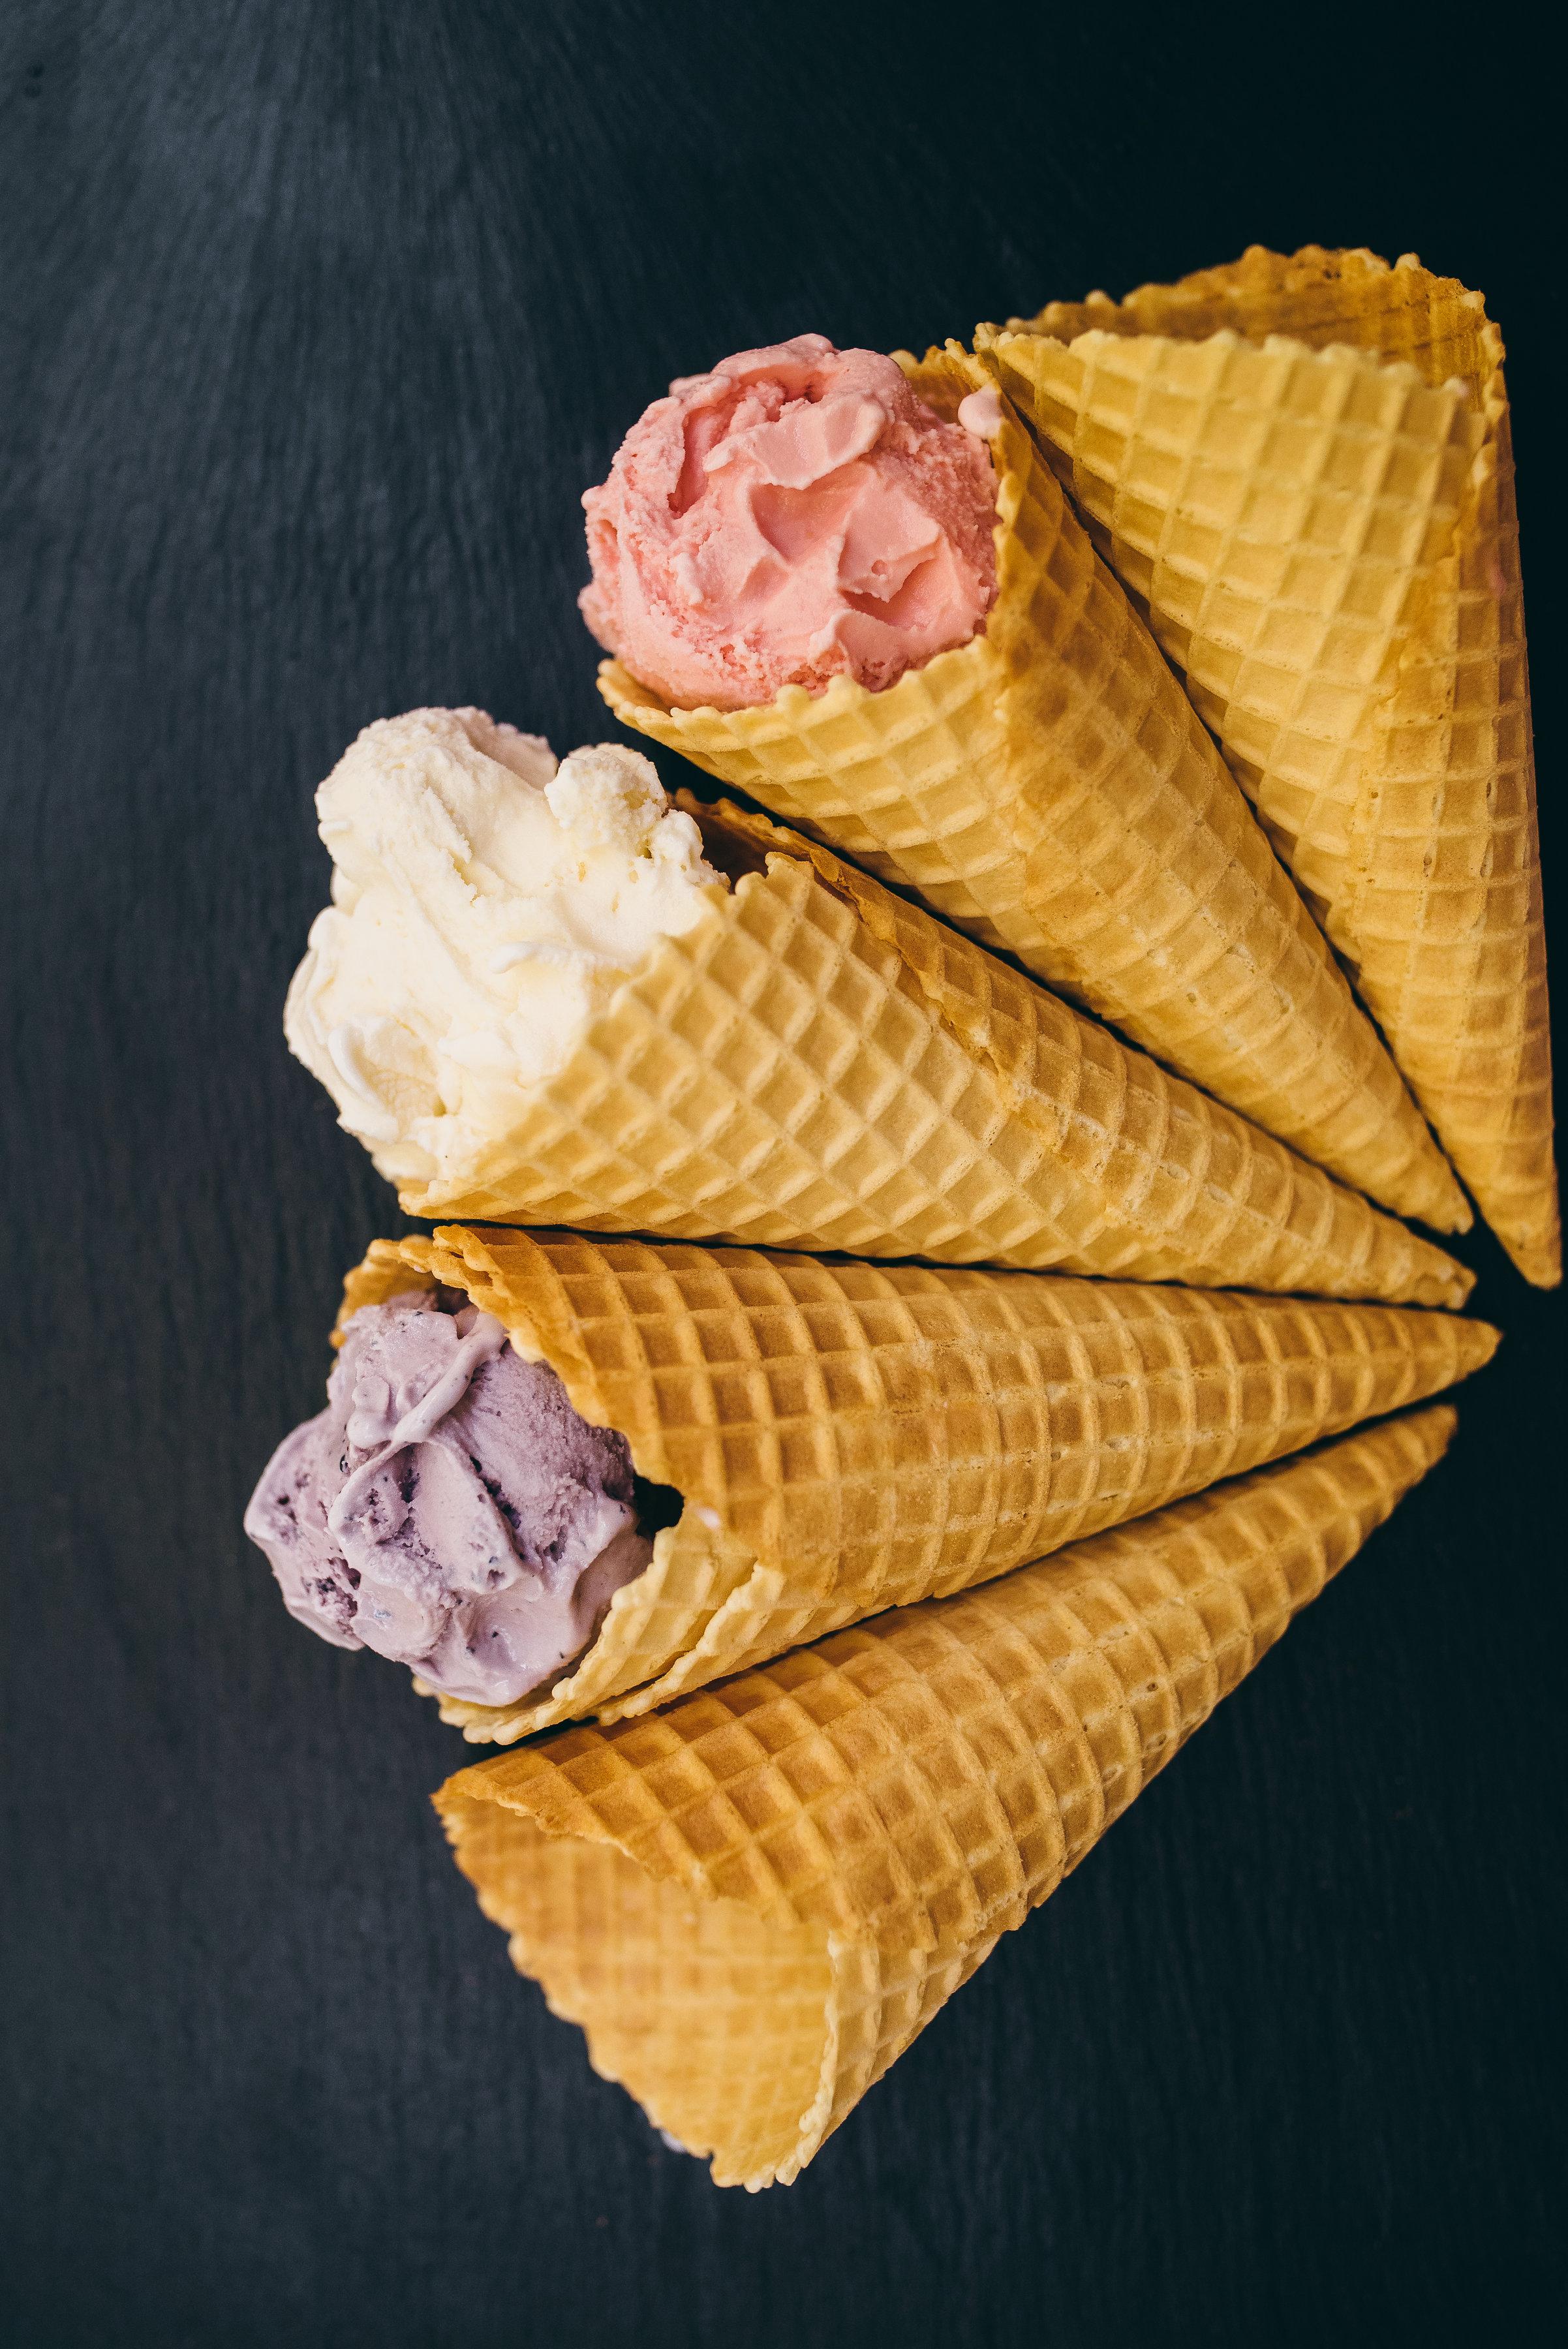 raleigh product photographer - raleigh ice cream photographer